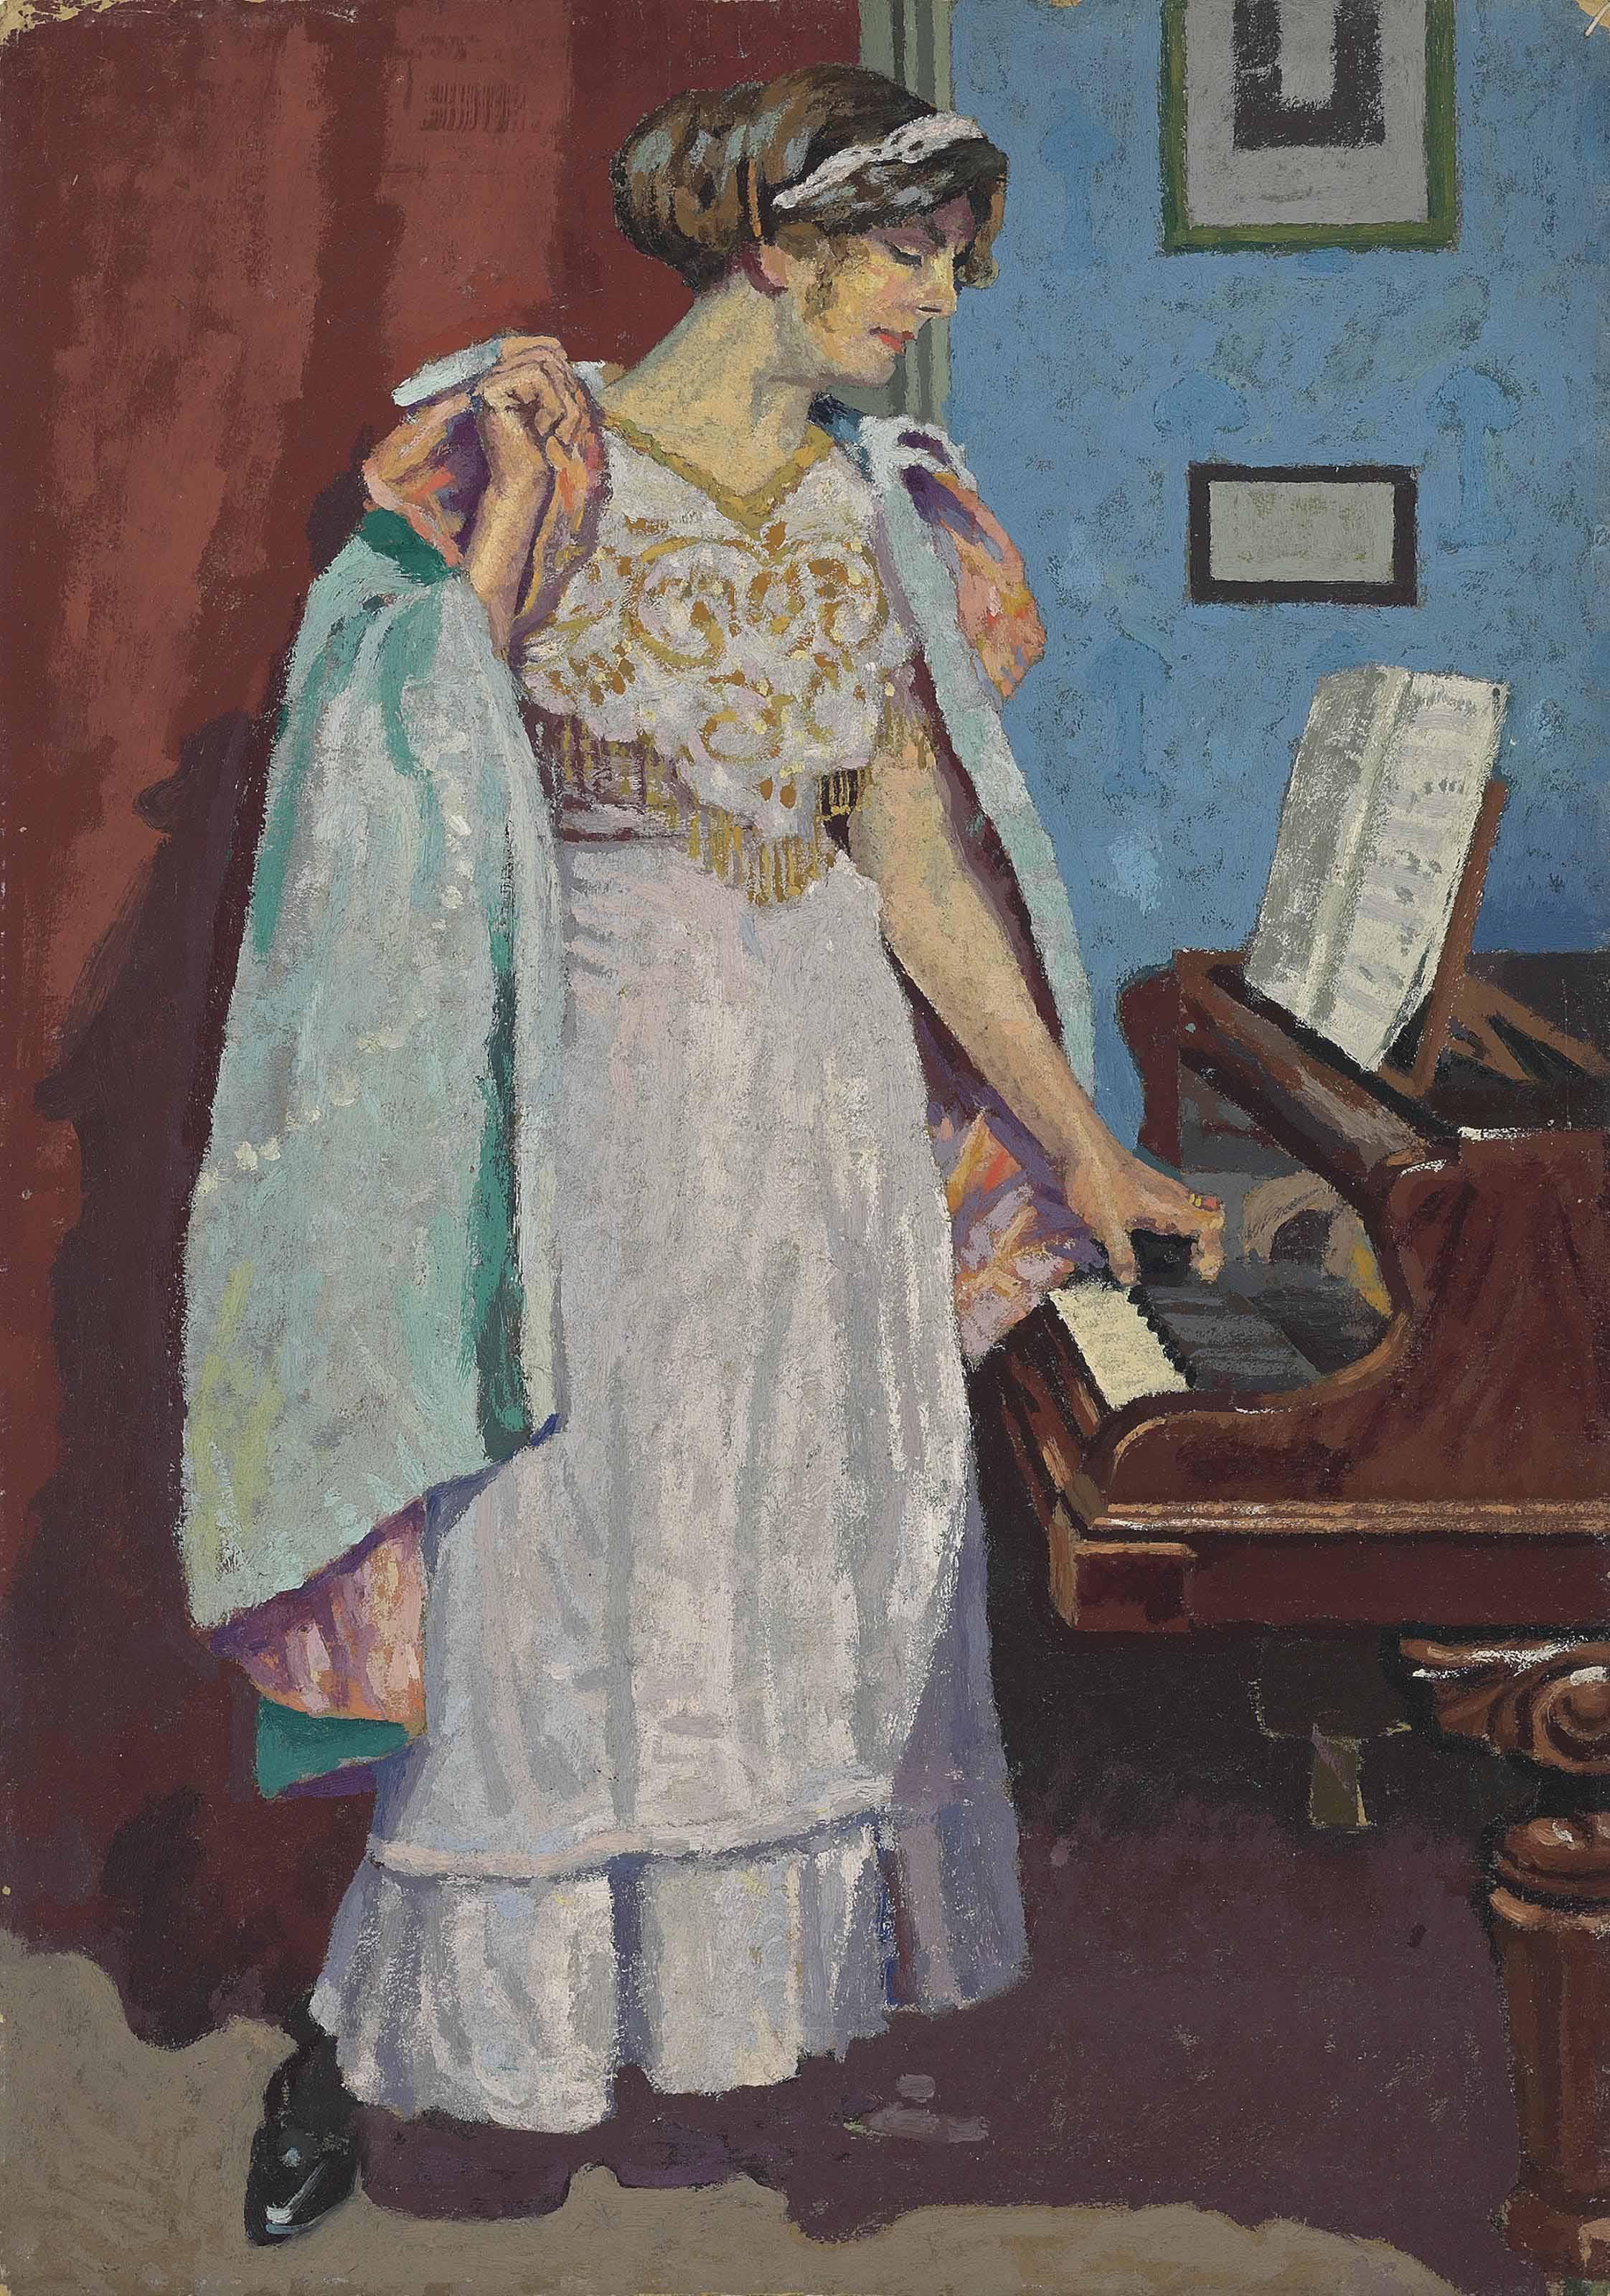 Arabesque at the piano; Zina Ogilvie, the artist's wife